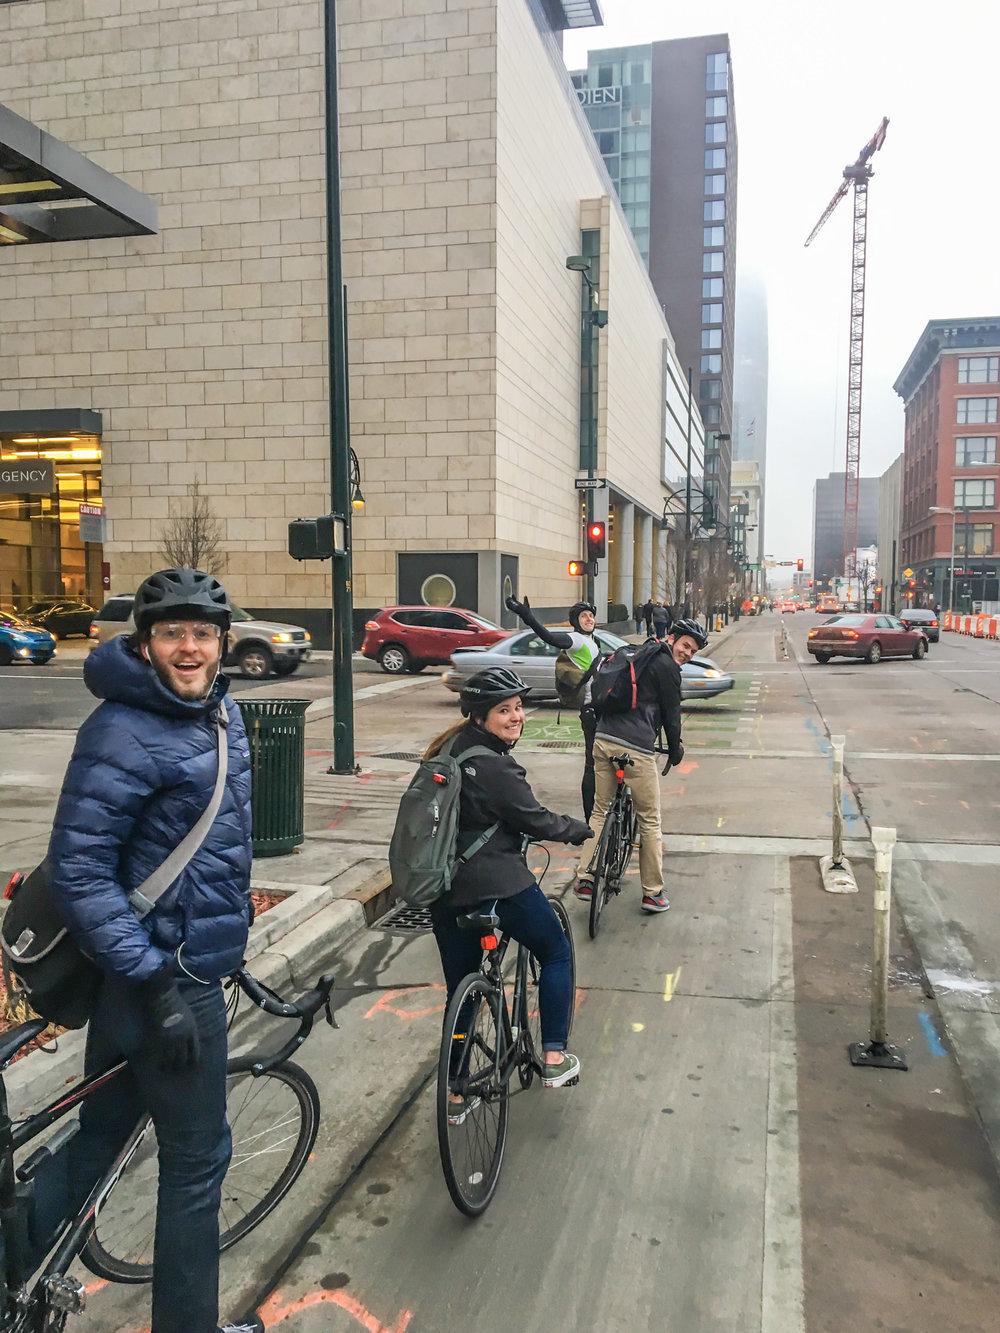 2018 02 09 - Winter Bike to Work Day  (16)-2.jpg